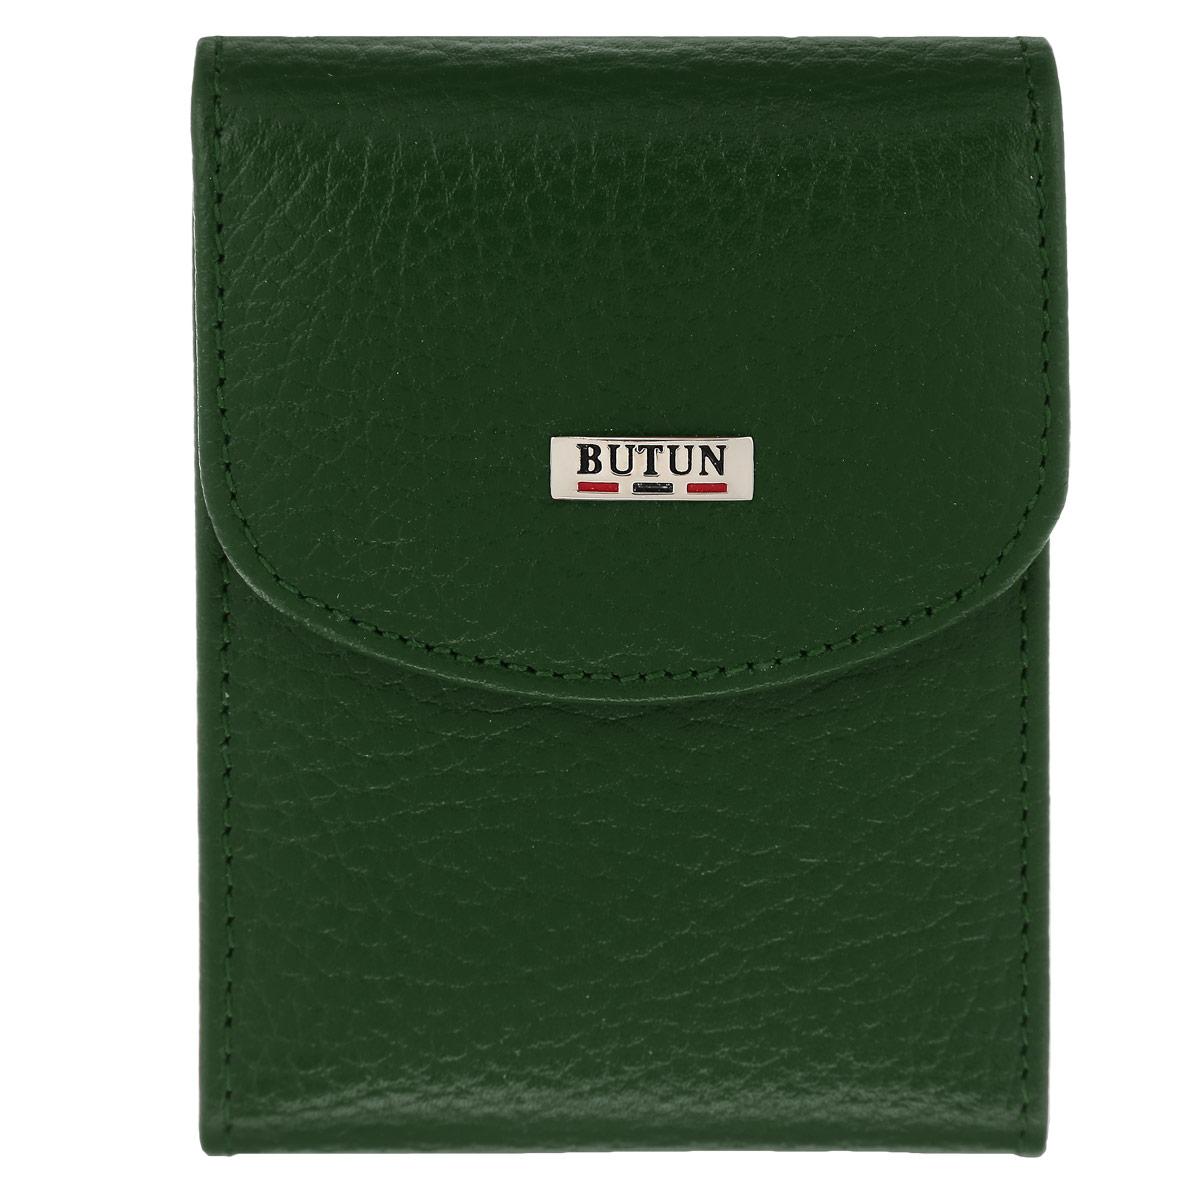 Футляр для визиток Butun, цвет: зеленый. 833-004 075 -  Визитницы